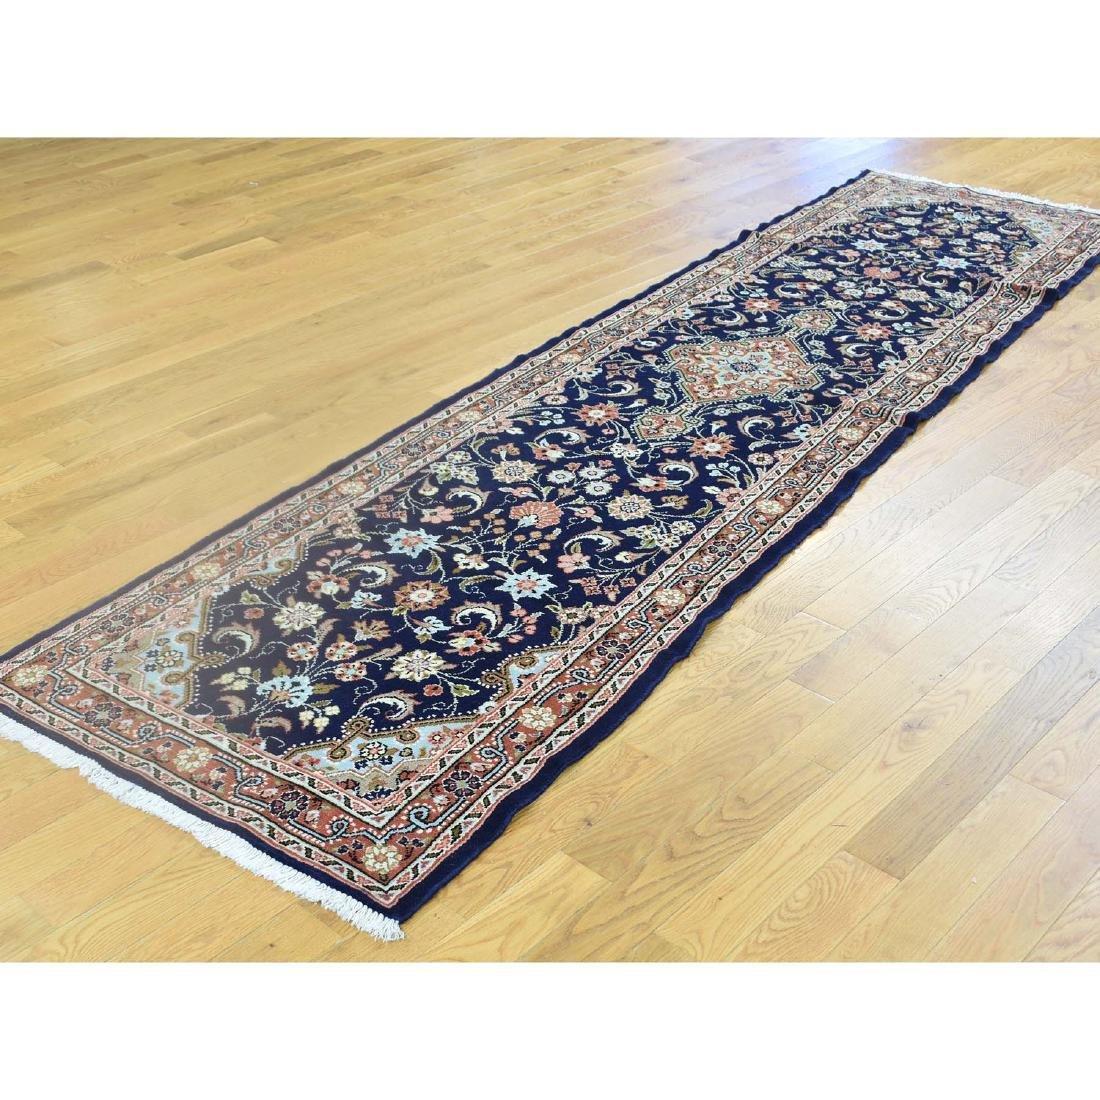 Handmade Persian Hamadan Runner Oriental Rug 2.8x10.2 - 4